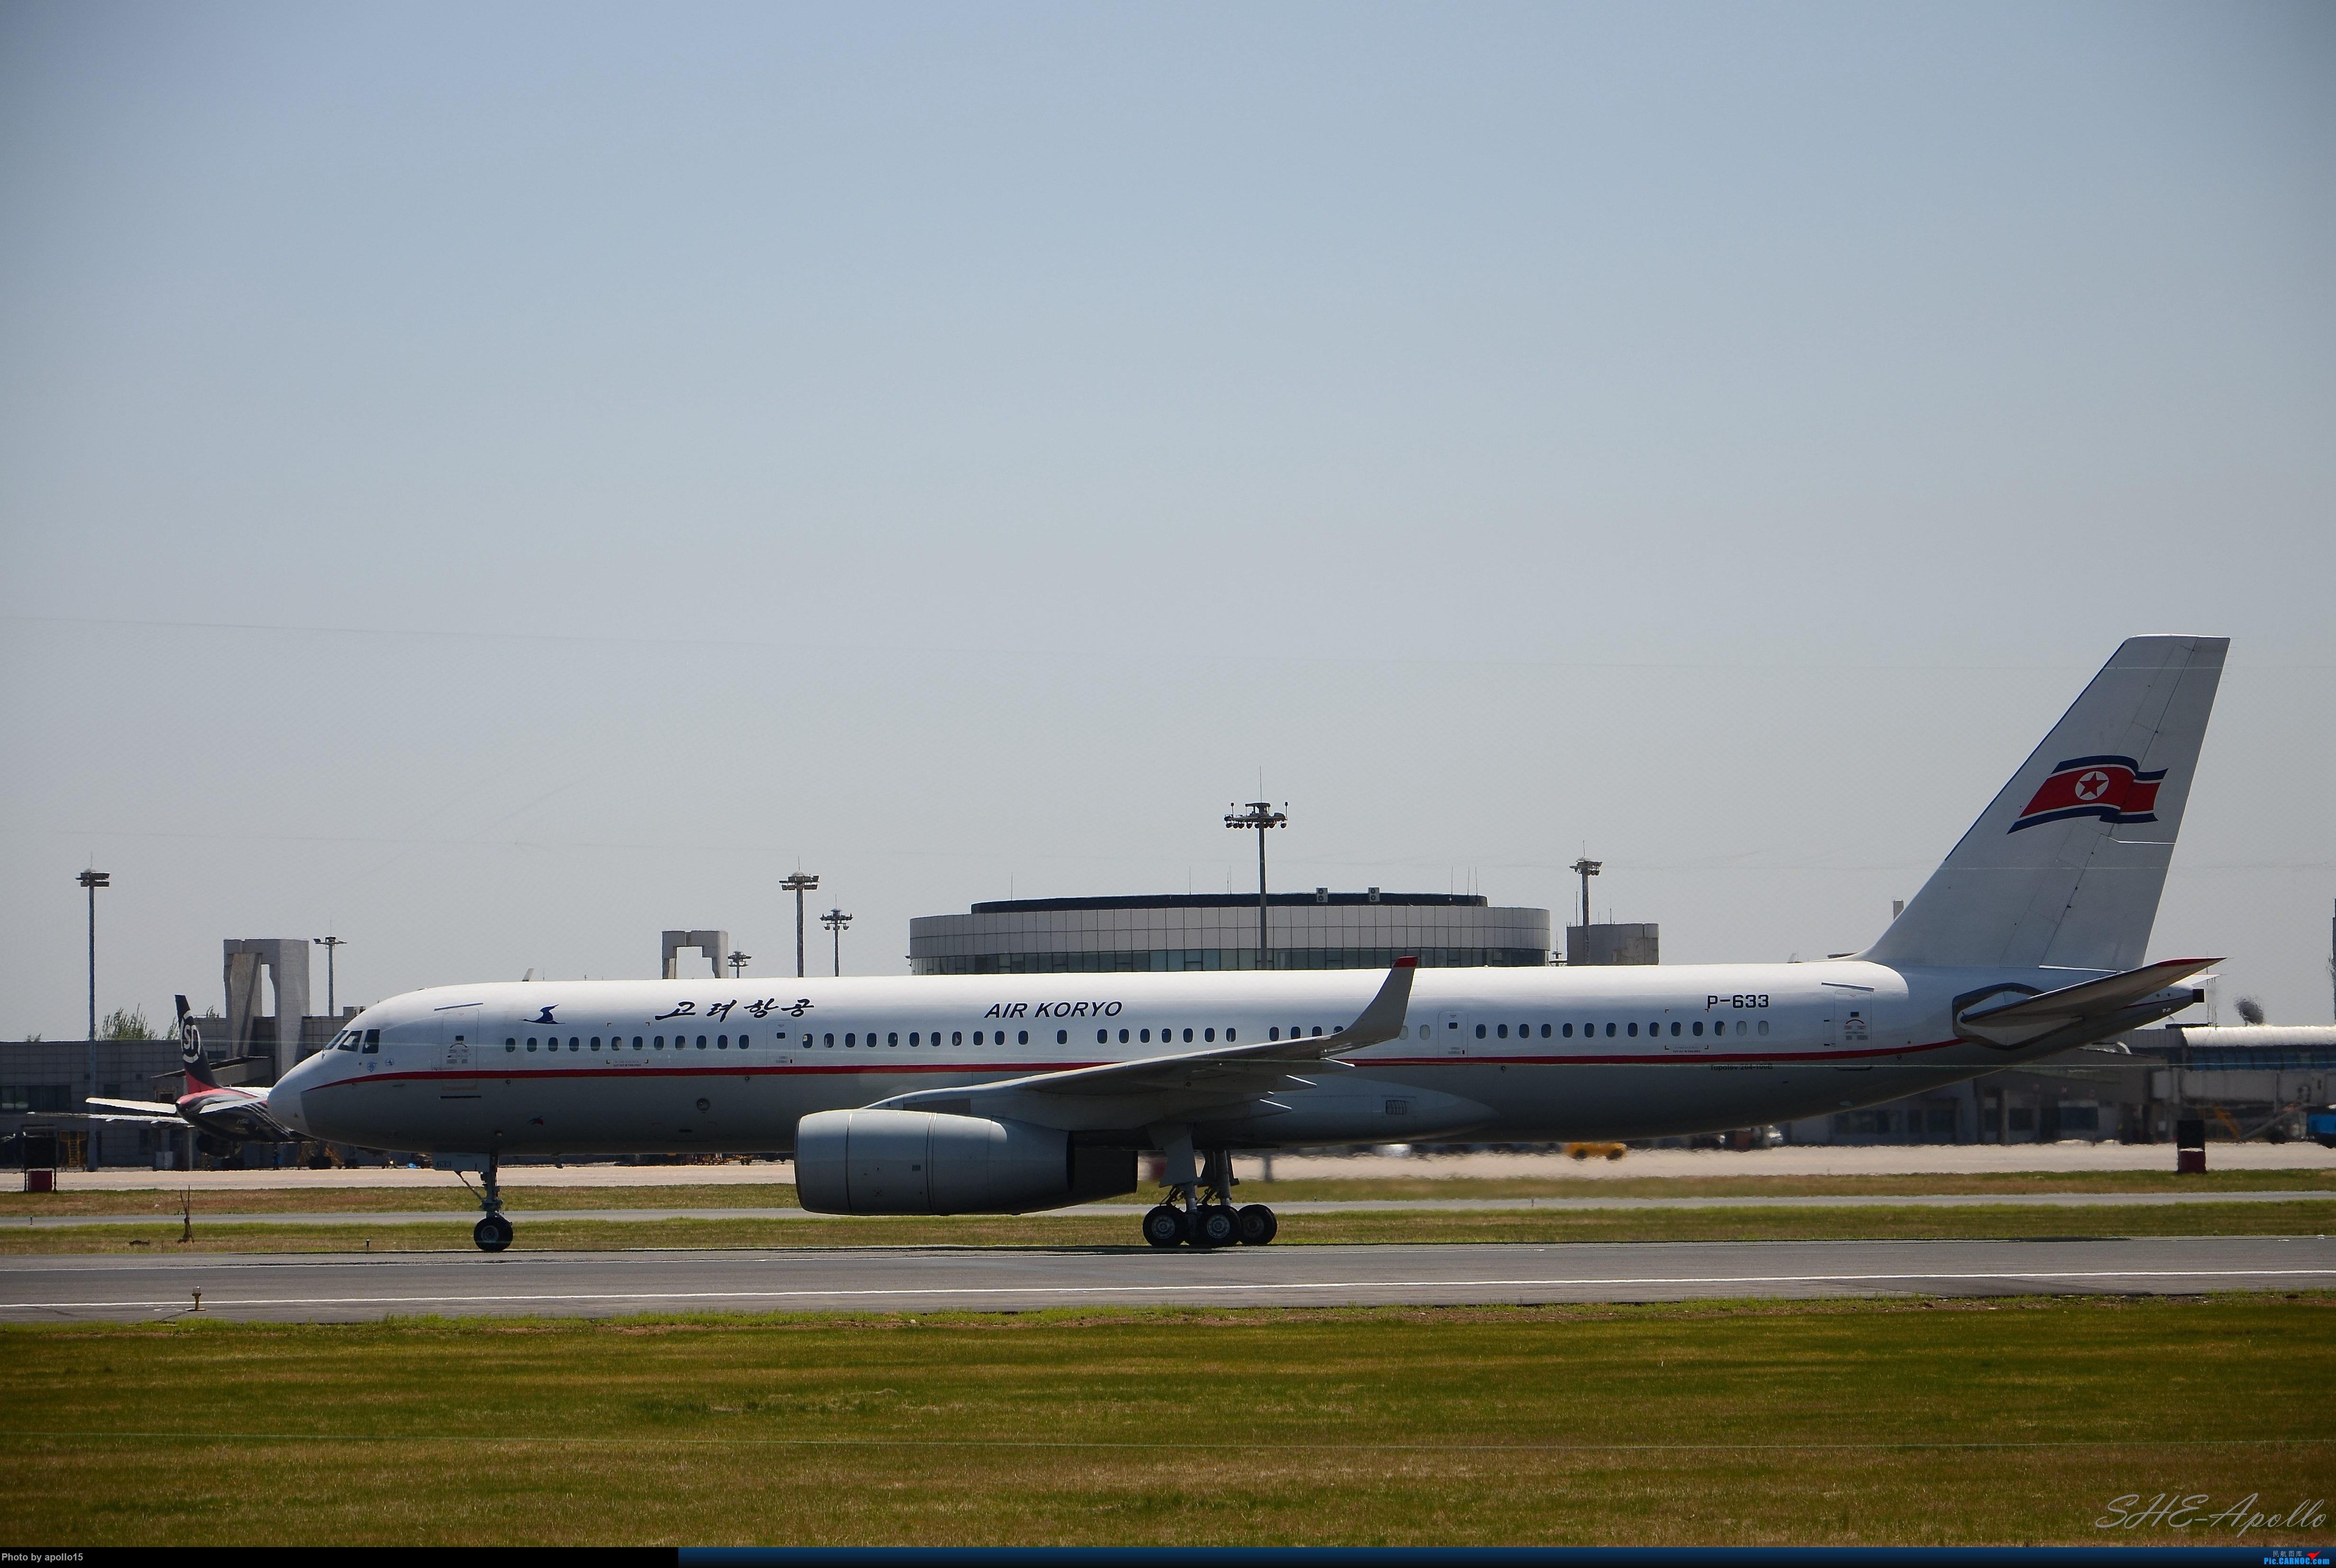 Re:[原创]Re:[原创]【SHE】五一拍机机 TUPOLEV TU-204-100 P-633 中国沈阳桃仙国际机场